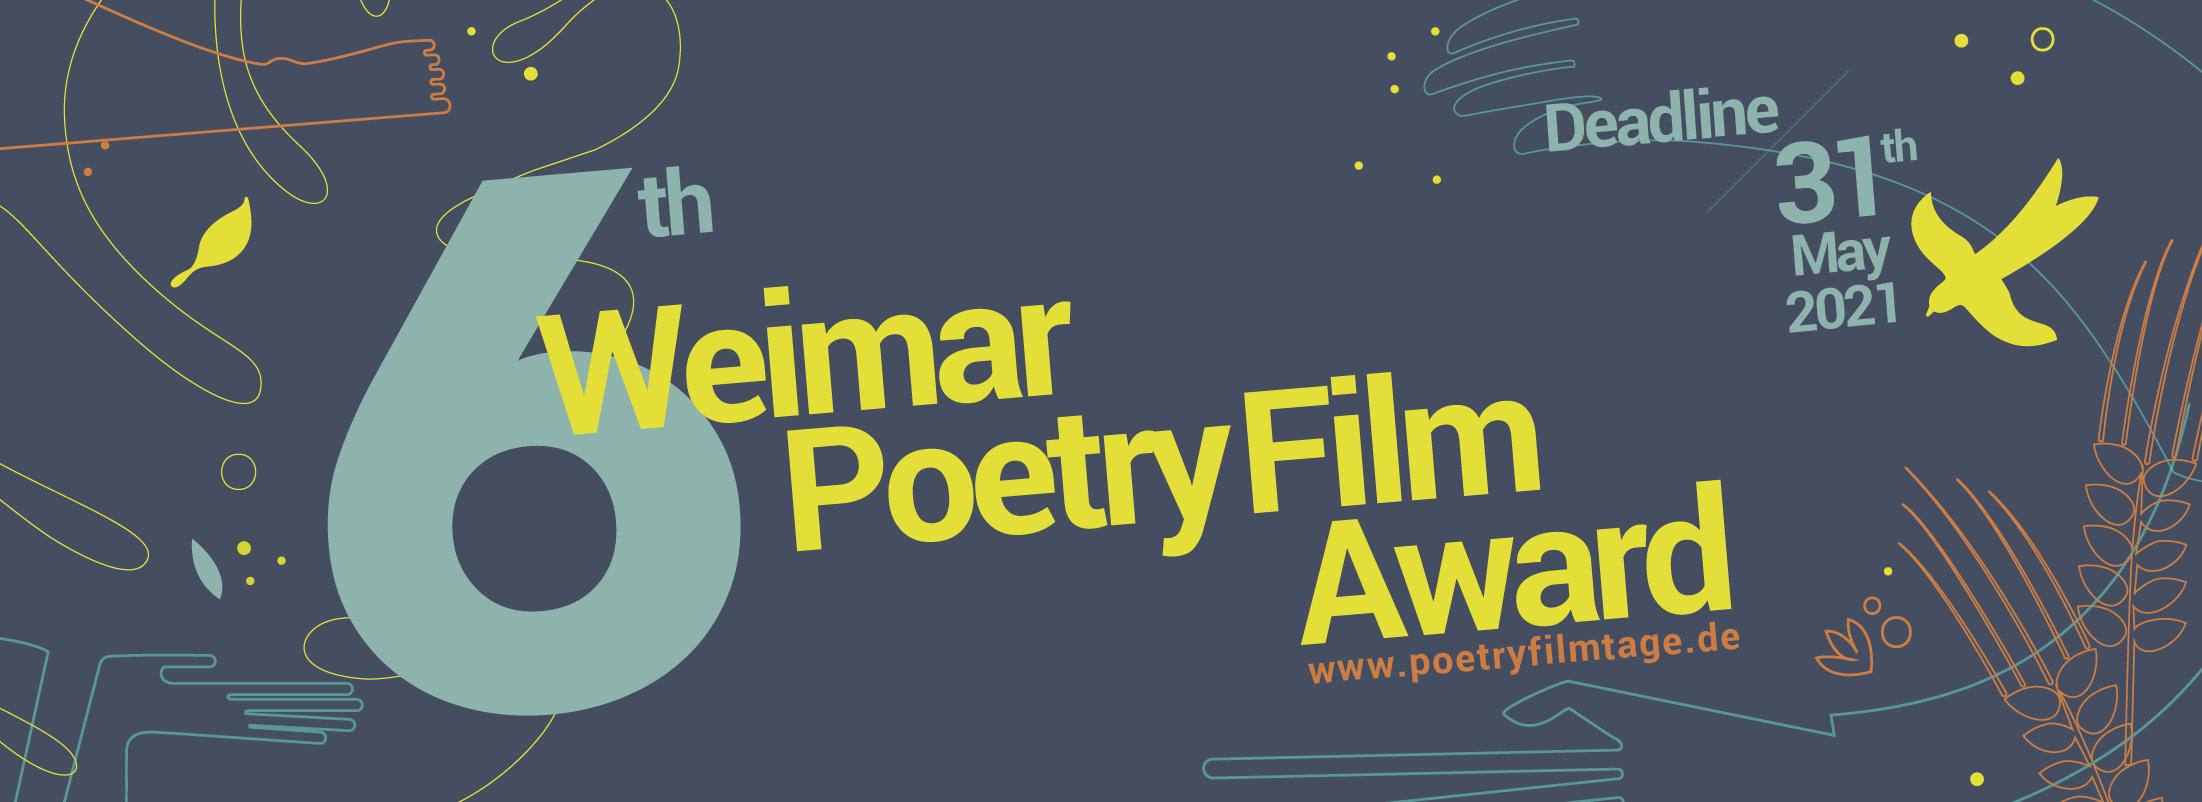 6th Weimar Poetry Film Award